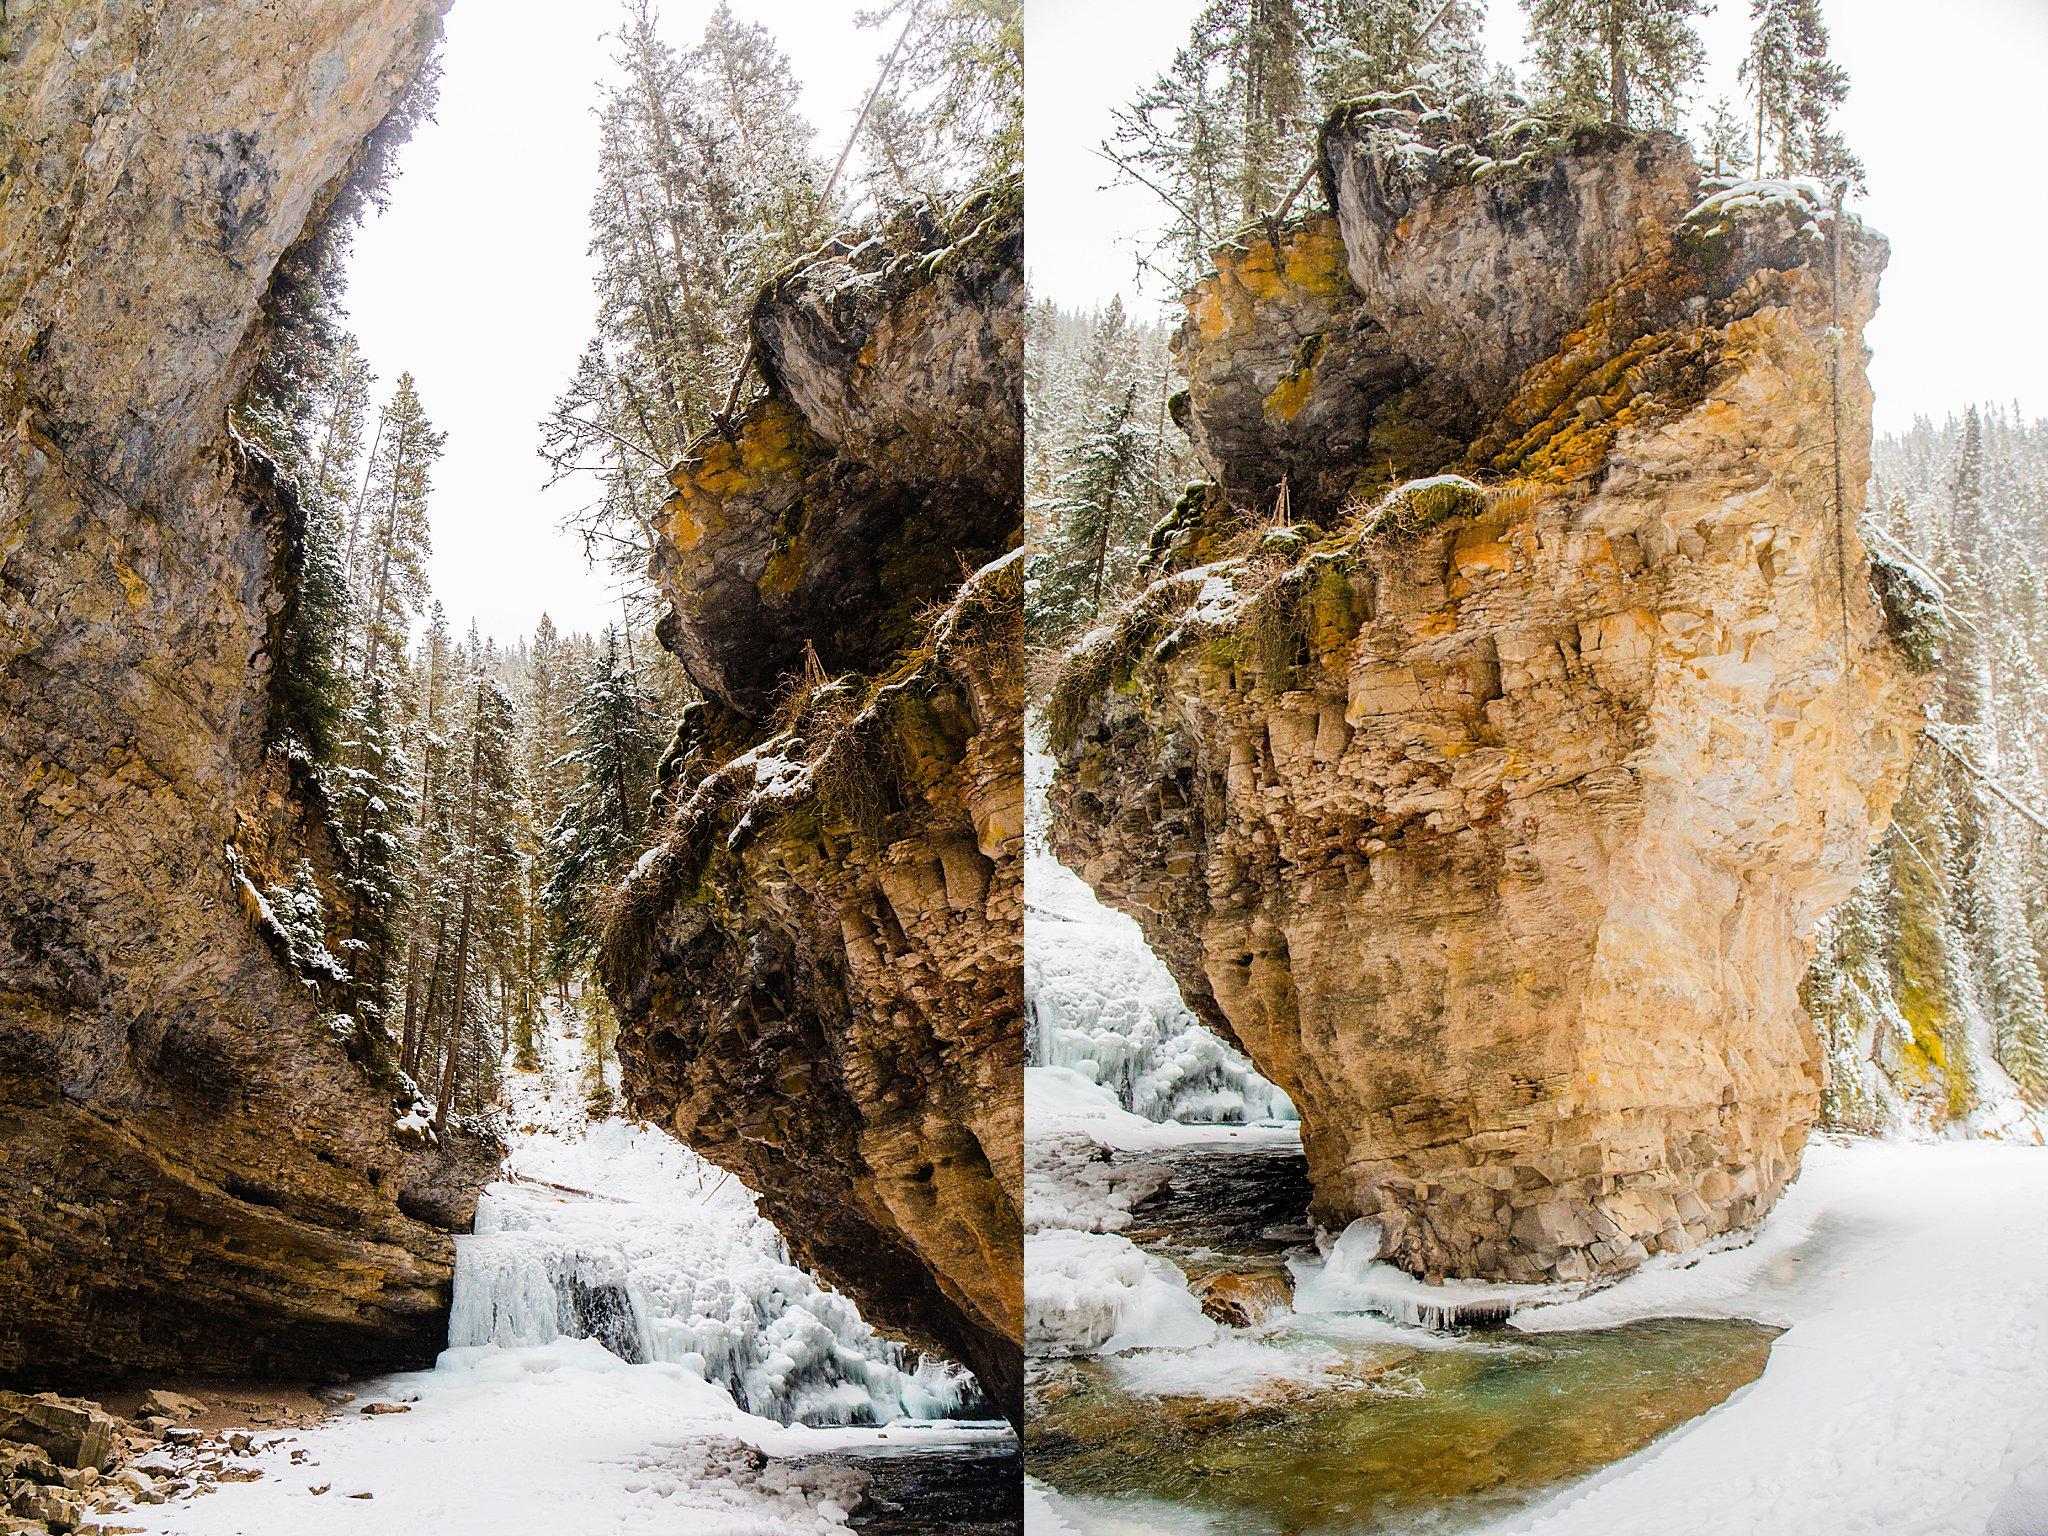 winter, alberta, visit alberta, johnston canyon, johnson canyon winter, ice walk, lower falls, upper falls, banff, banff national park, visit banff in the winter, secret cave